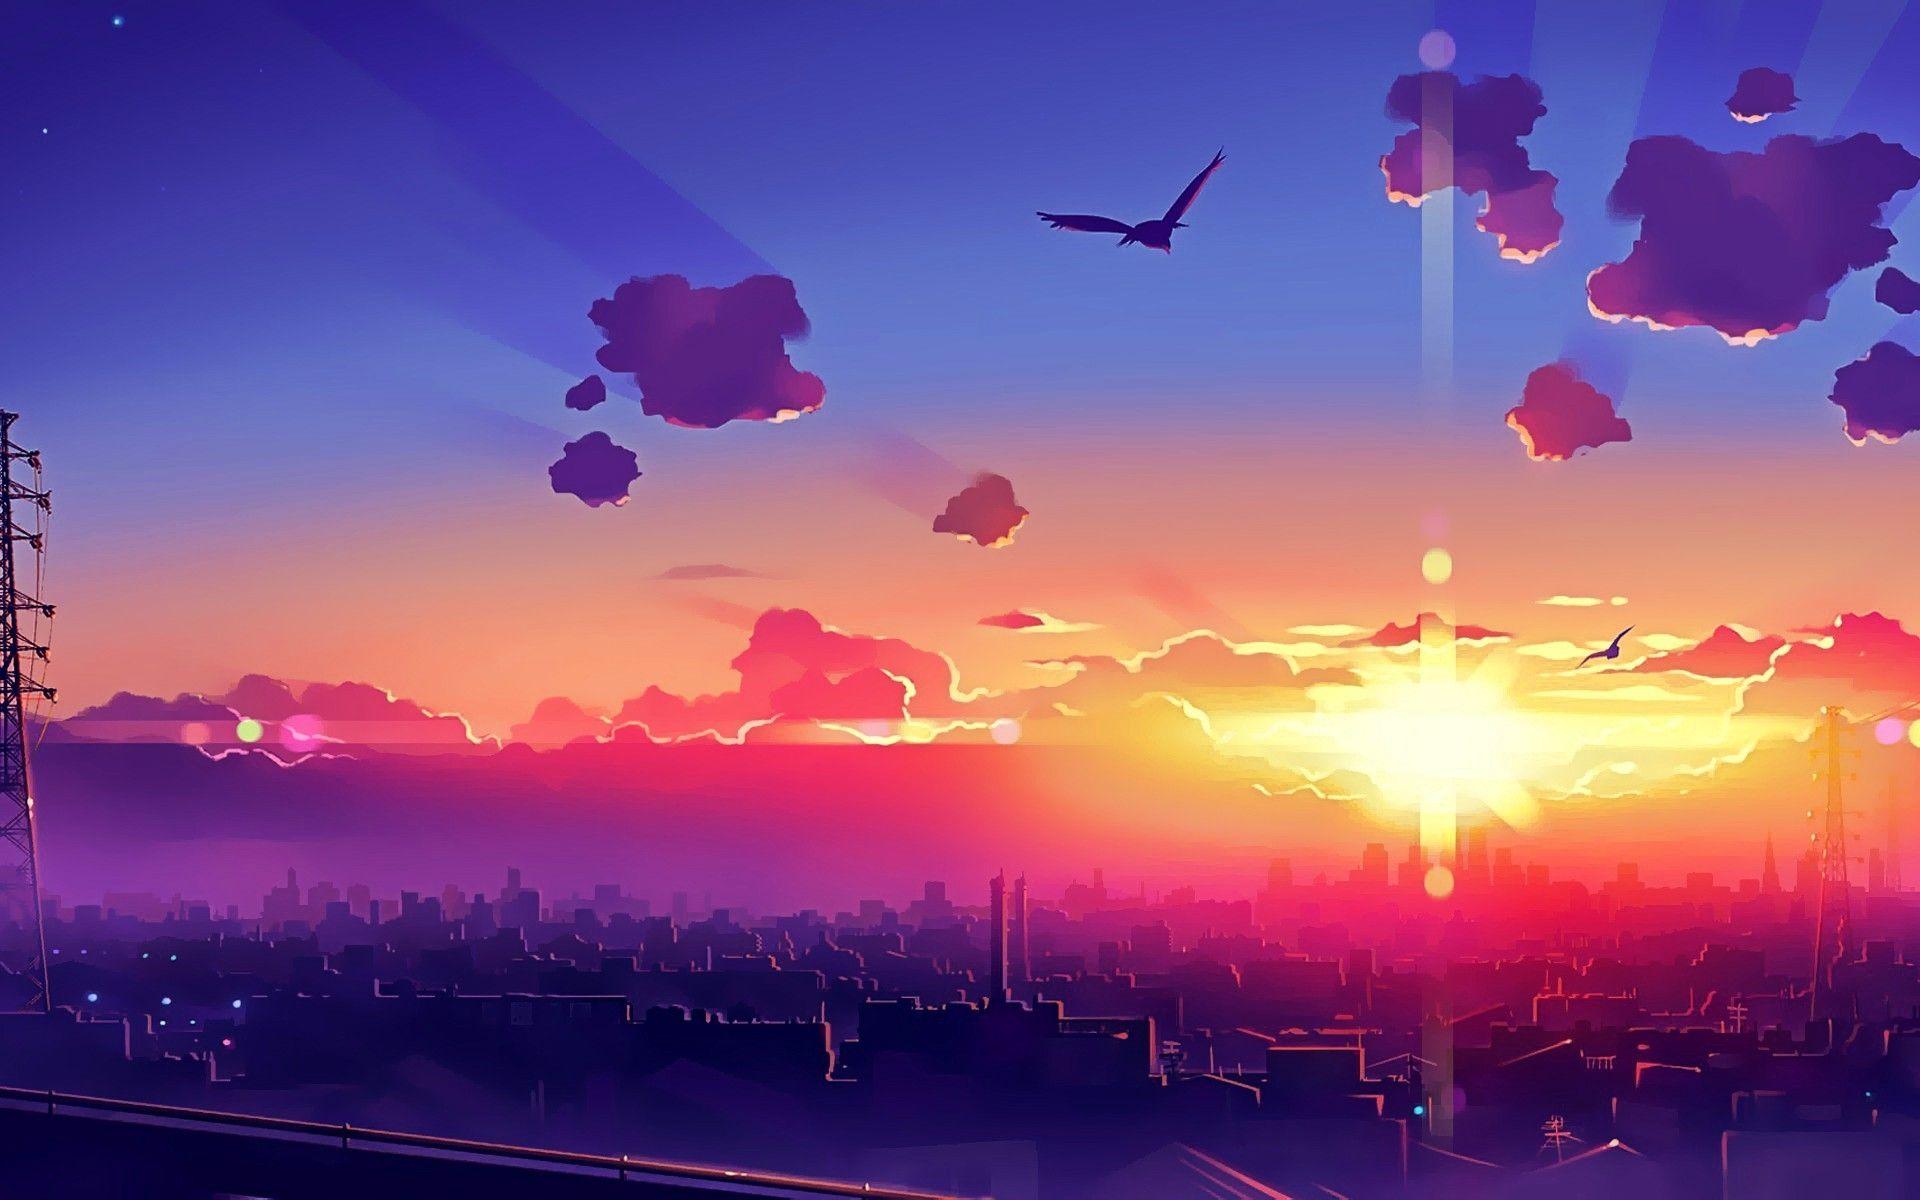 Anime Sunset _ Anime scenery, Anime scenery wallpaper